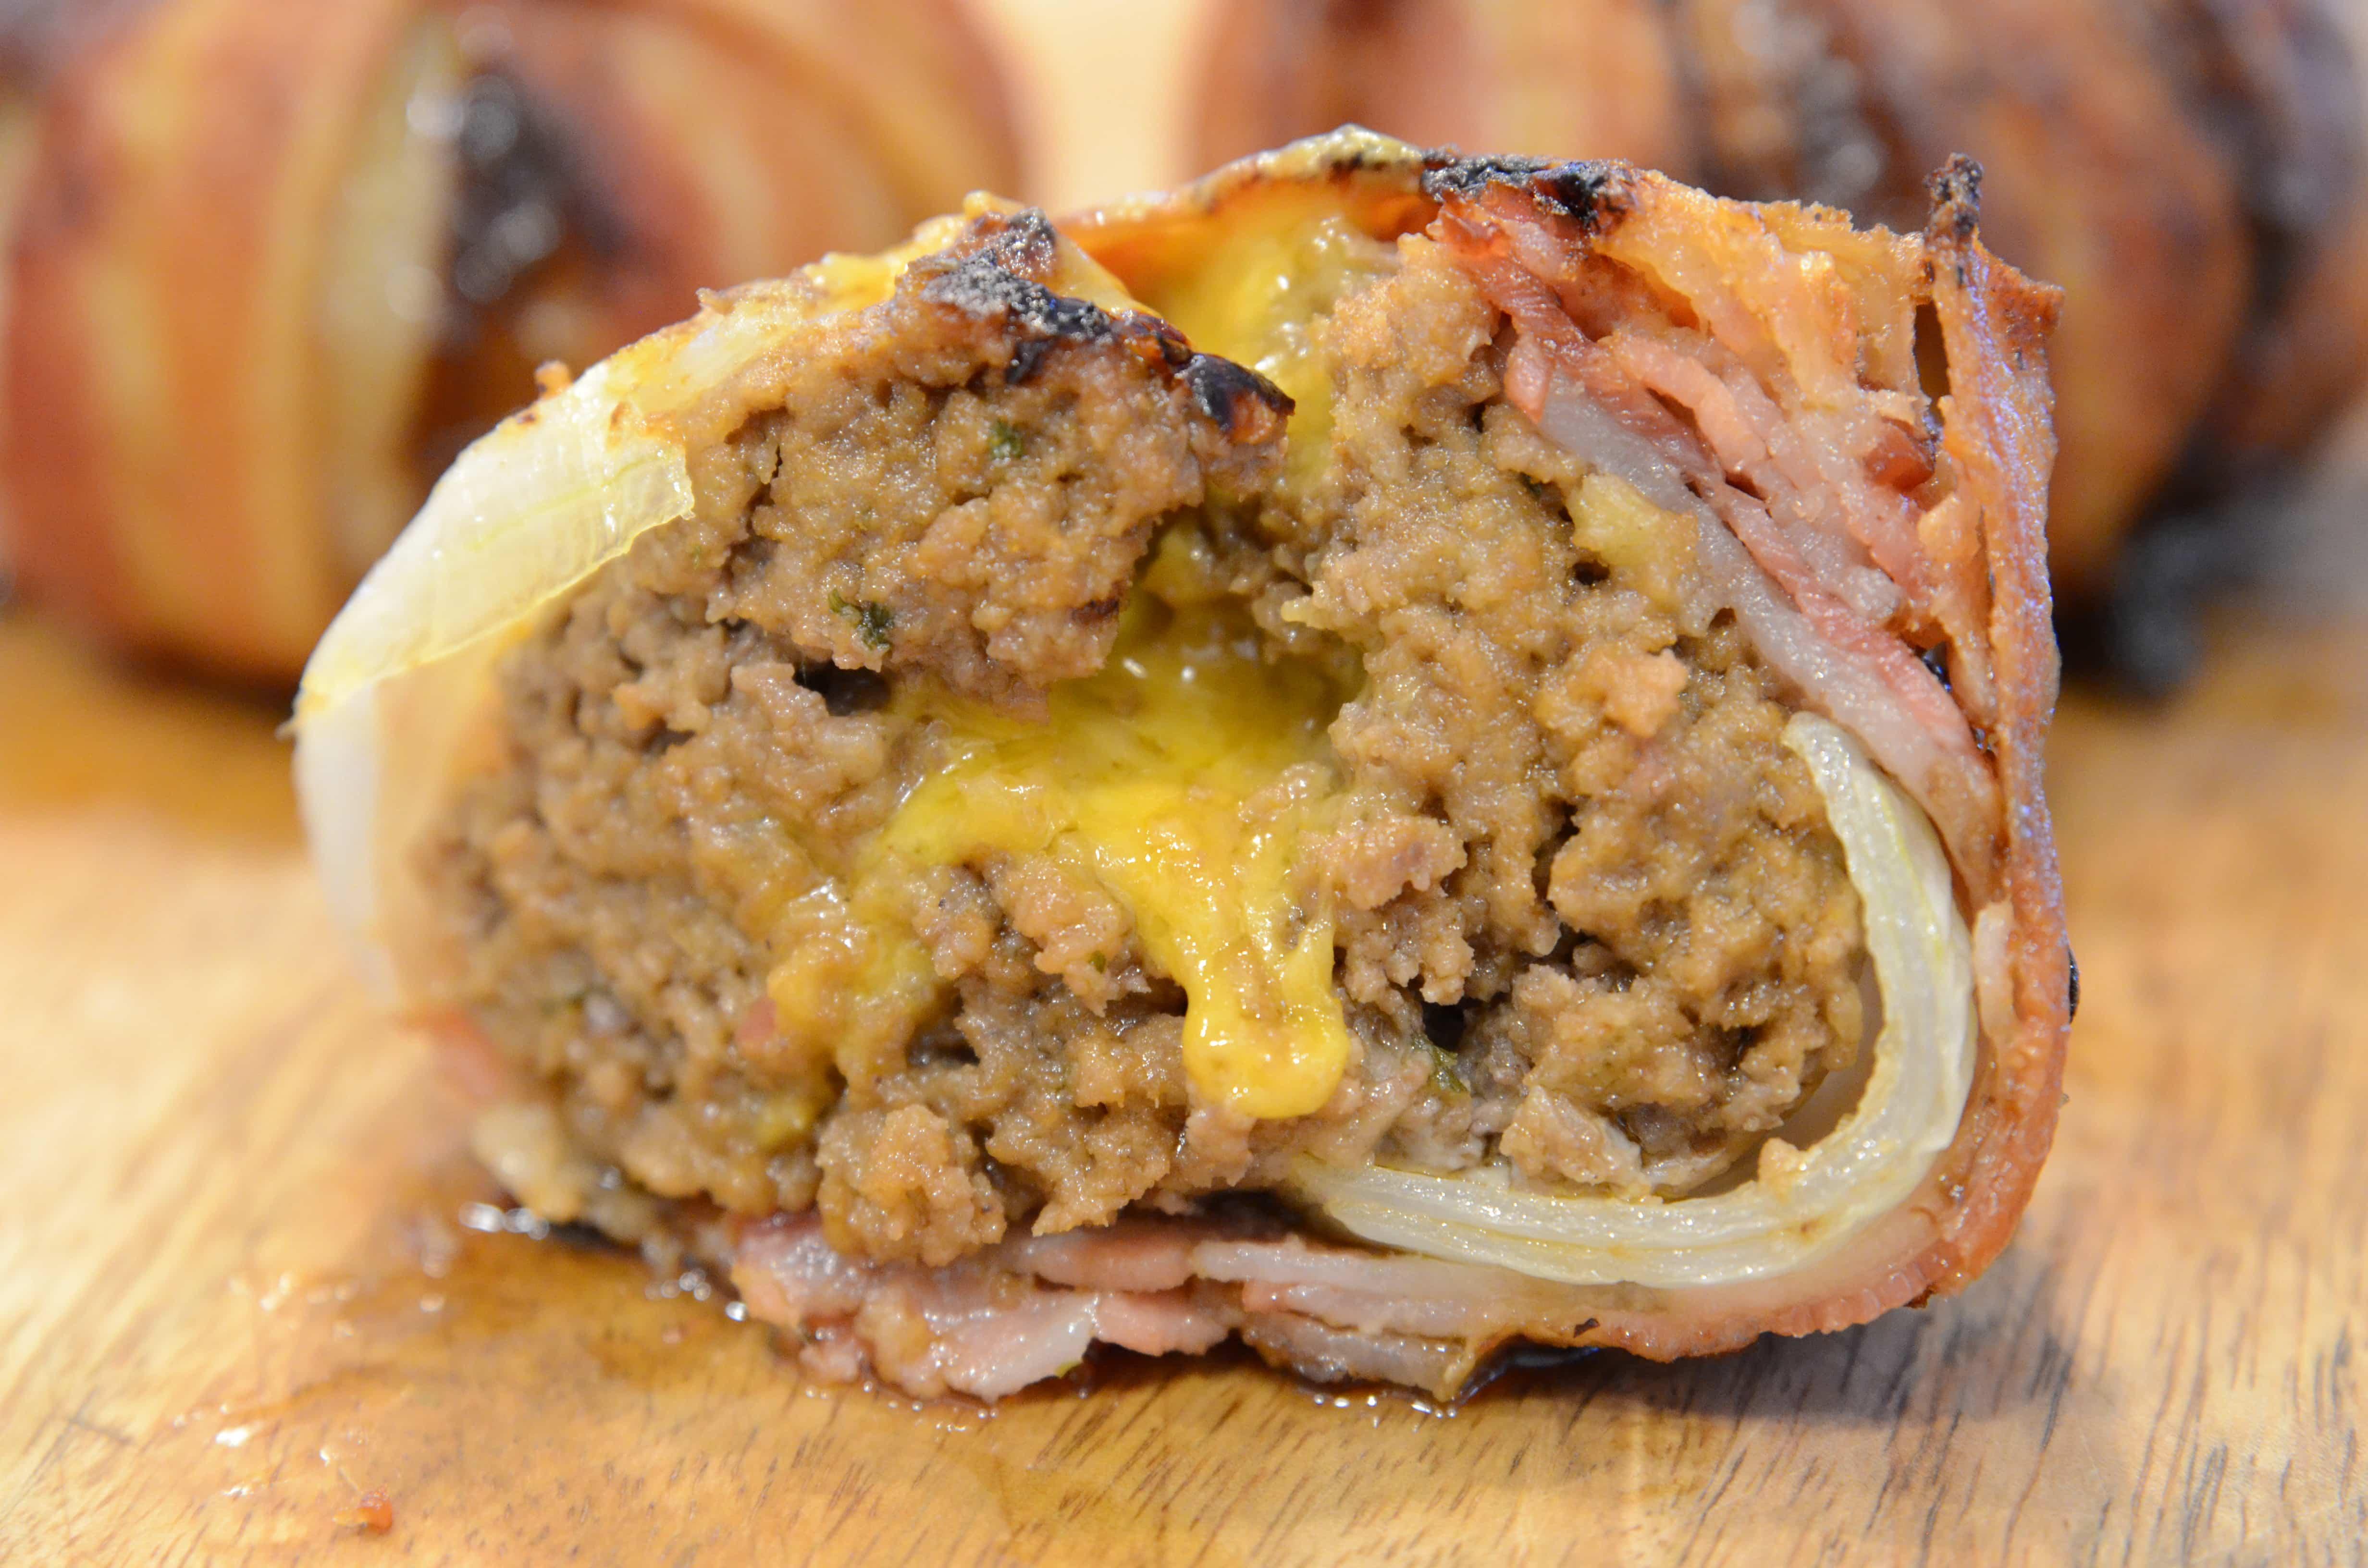 Air fryer Bacon Onion Bombs